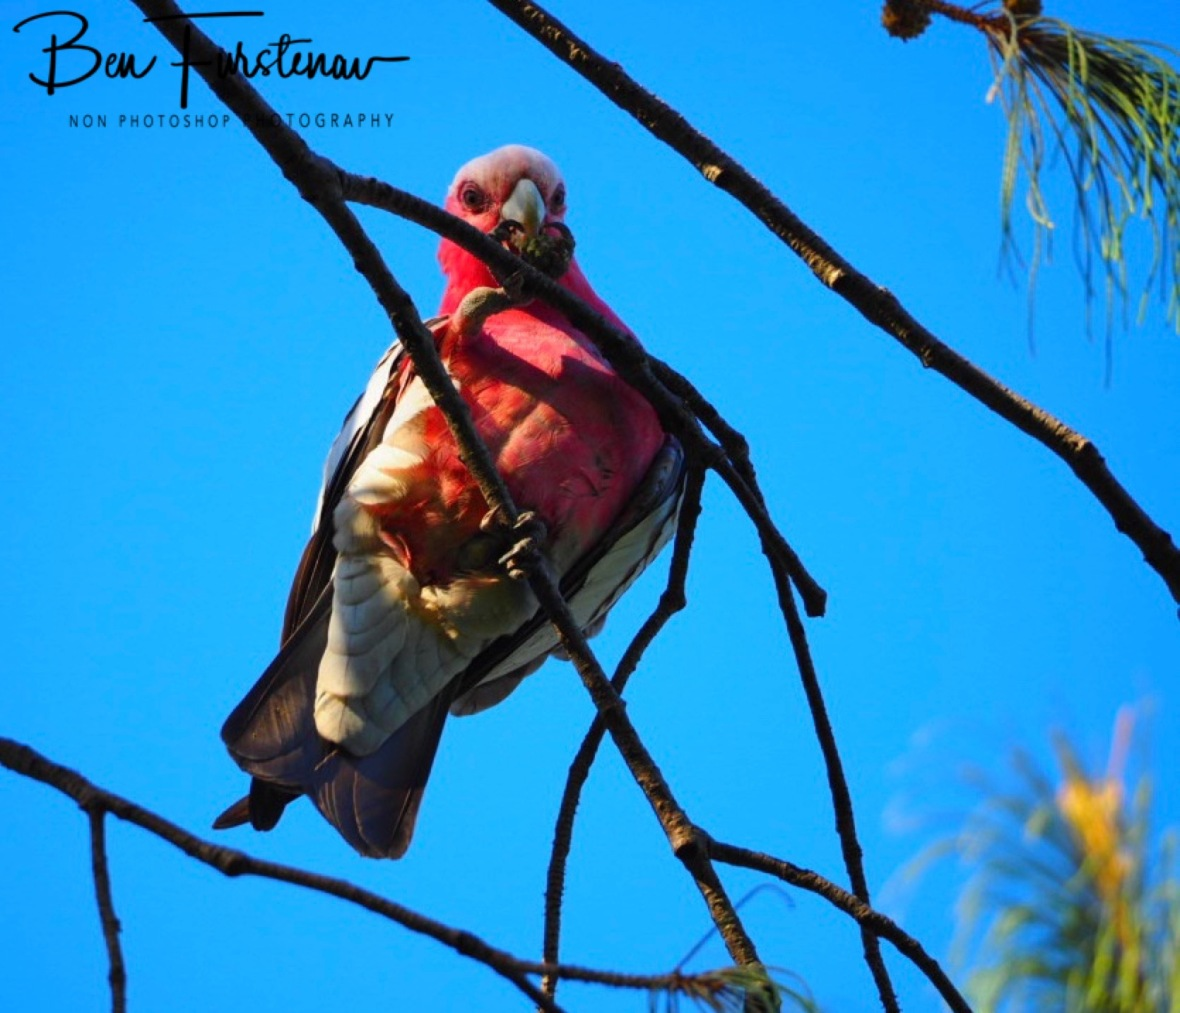 Pine cone vendor @ Woolgoolga, Northern New South Wales, Australia